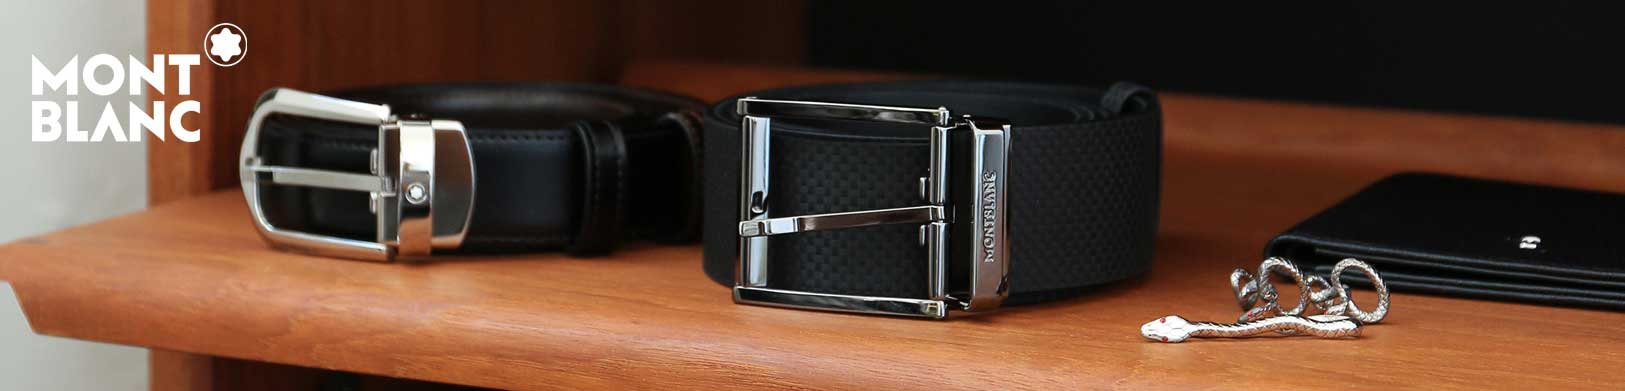 Montblanc Leather